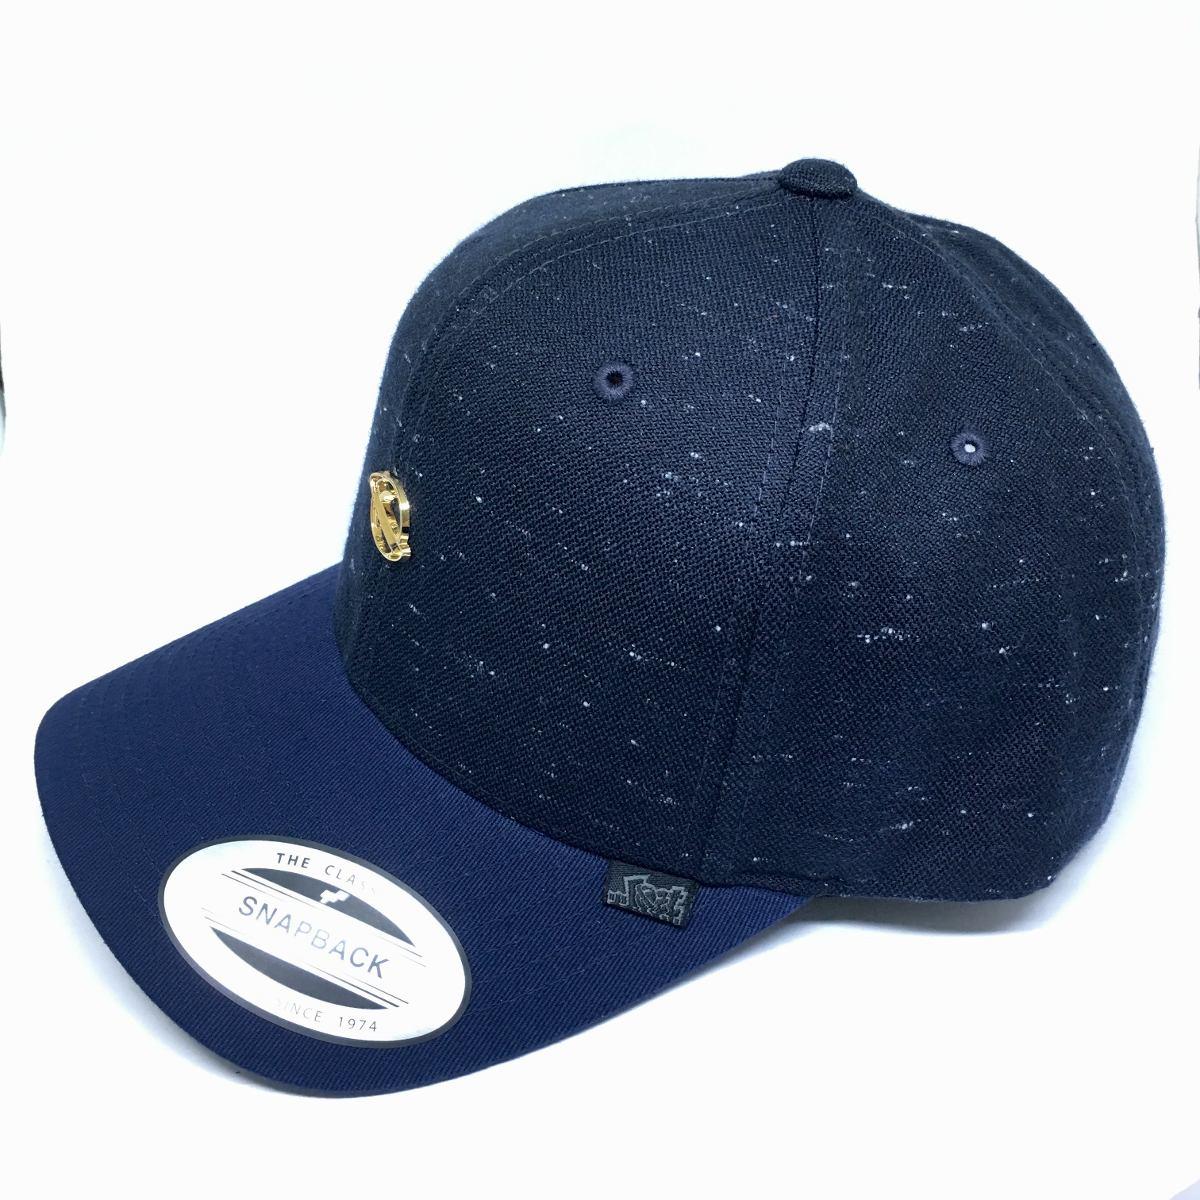 Boné Aba Curva Snapback Speckled Lost - 21716510 Azul Marinh - R ... dab50340d25